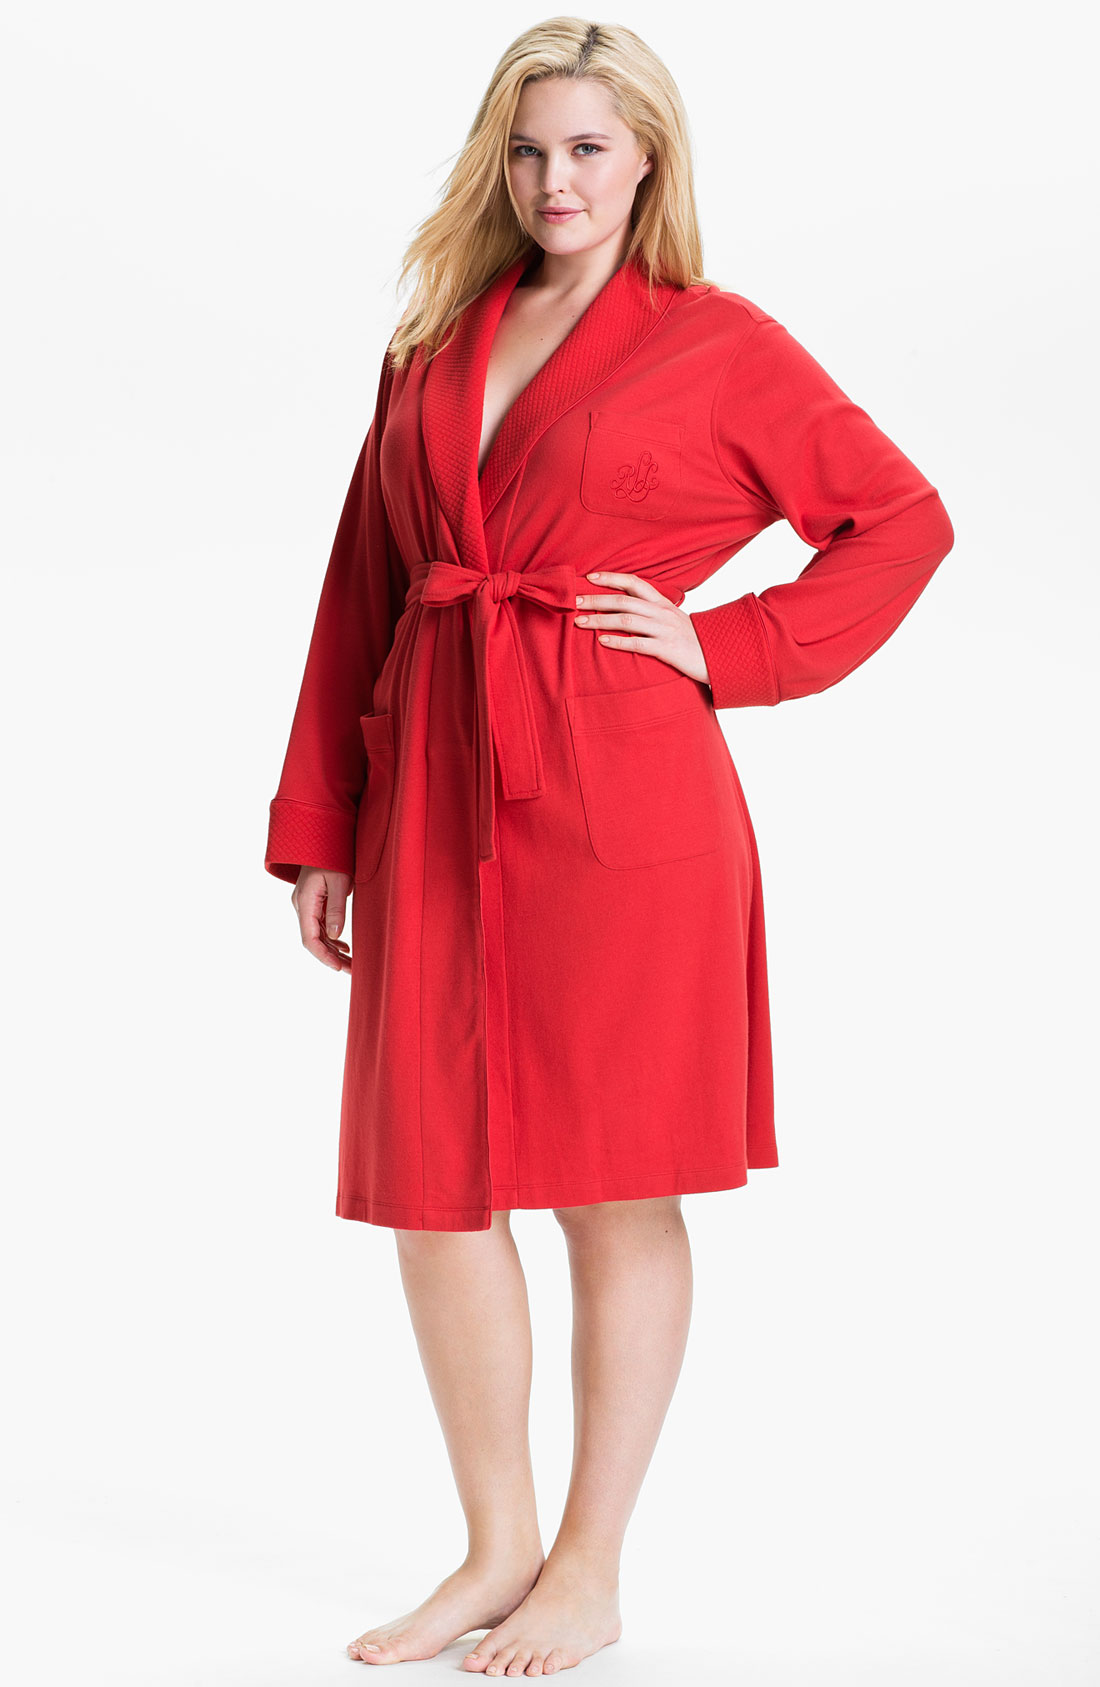 lauren by ralph lauren sleepwear shawl collar robe in red holiday red lyst. Black Bedroom Furniture Sets. Home Design Ideas